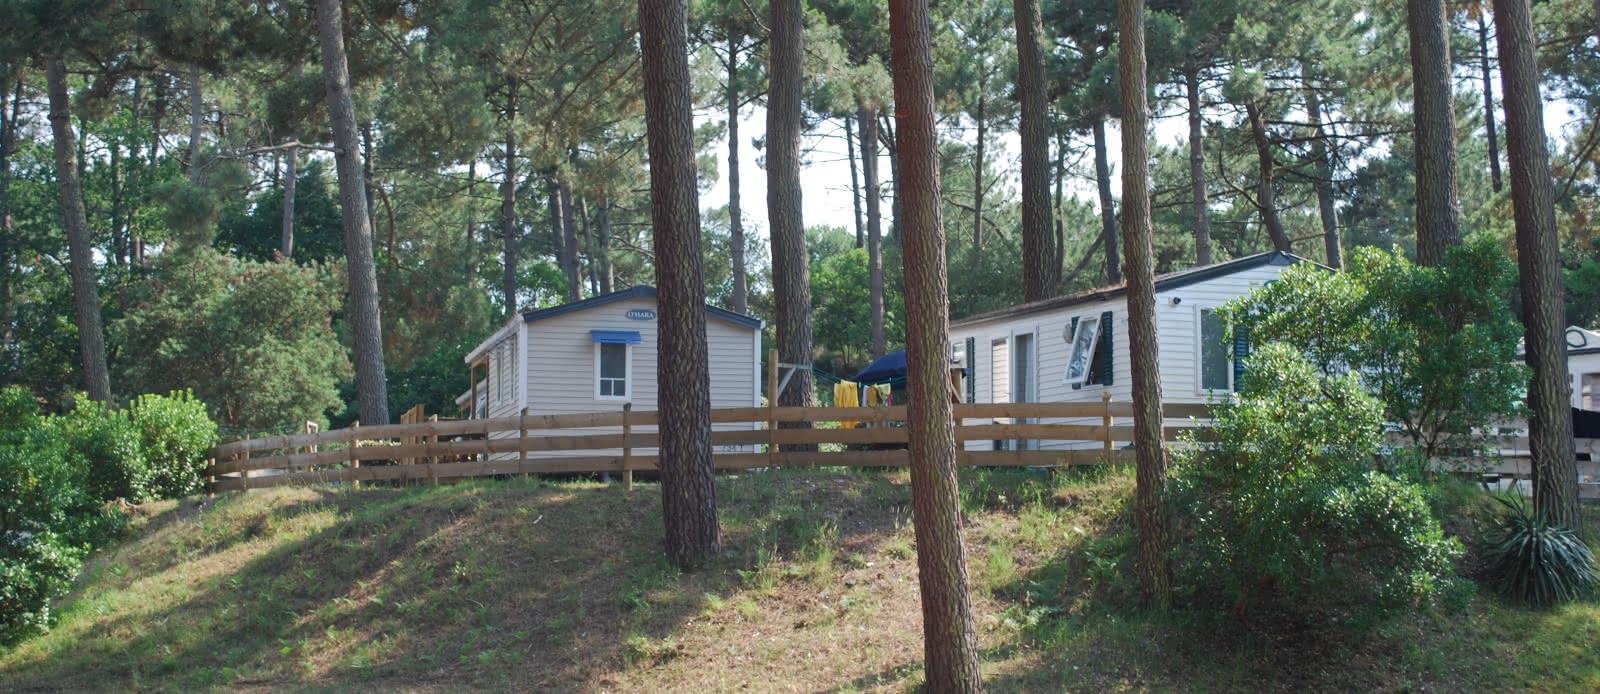 Camping de Maubuisson Carcans Maubuisson